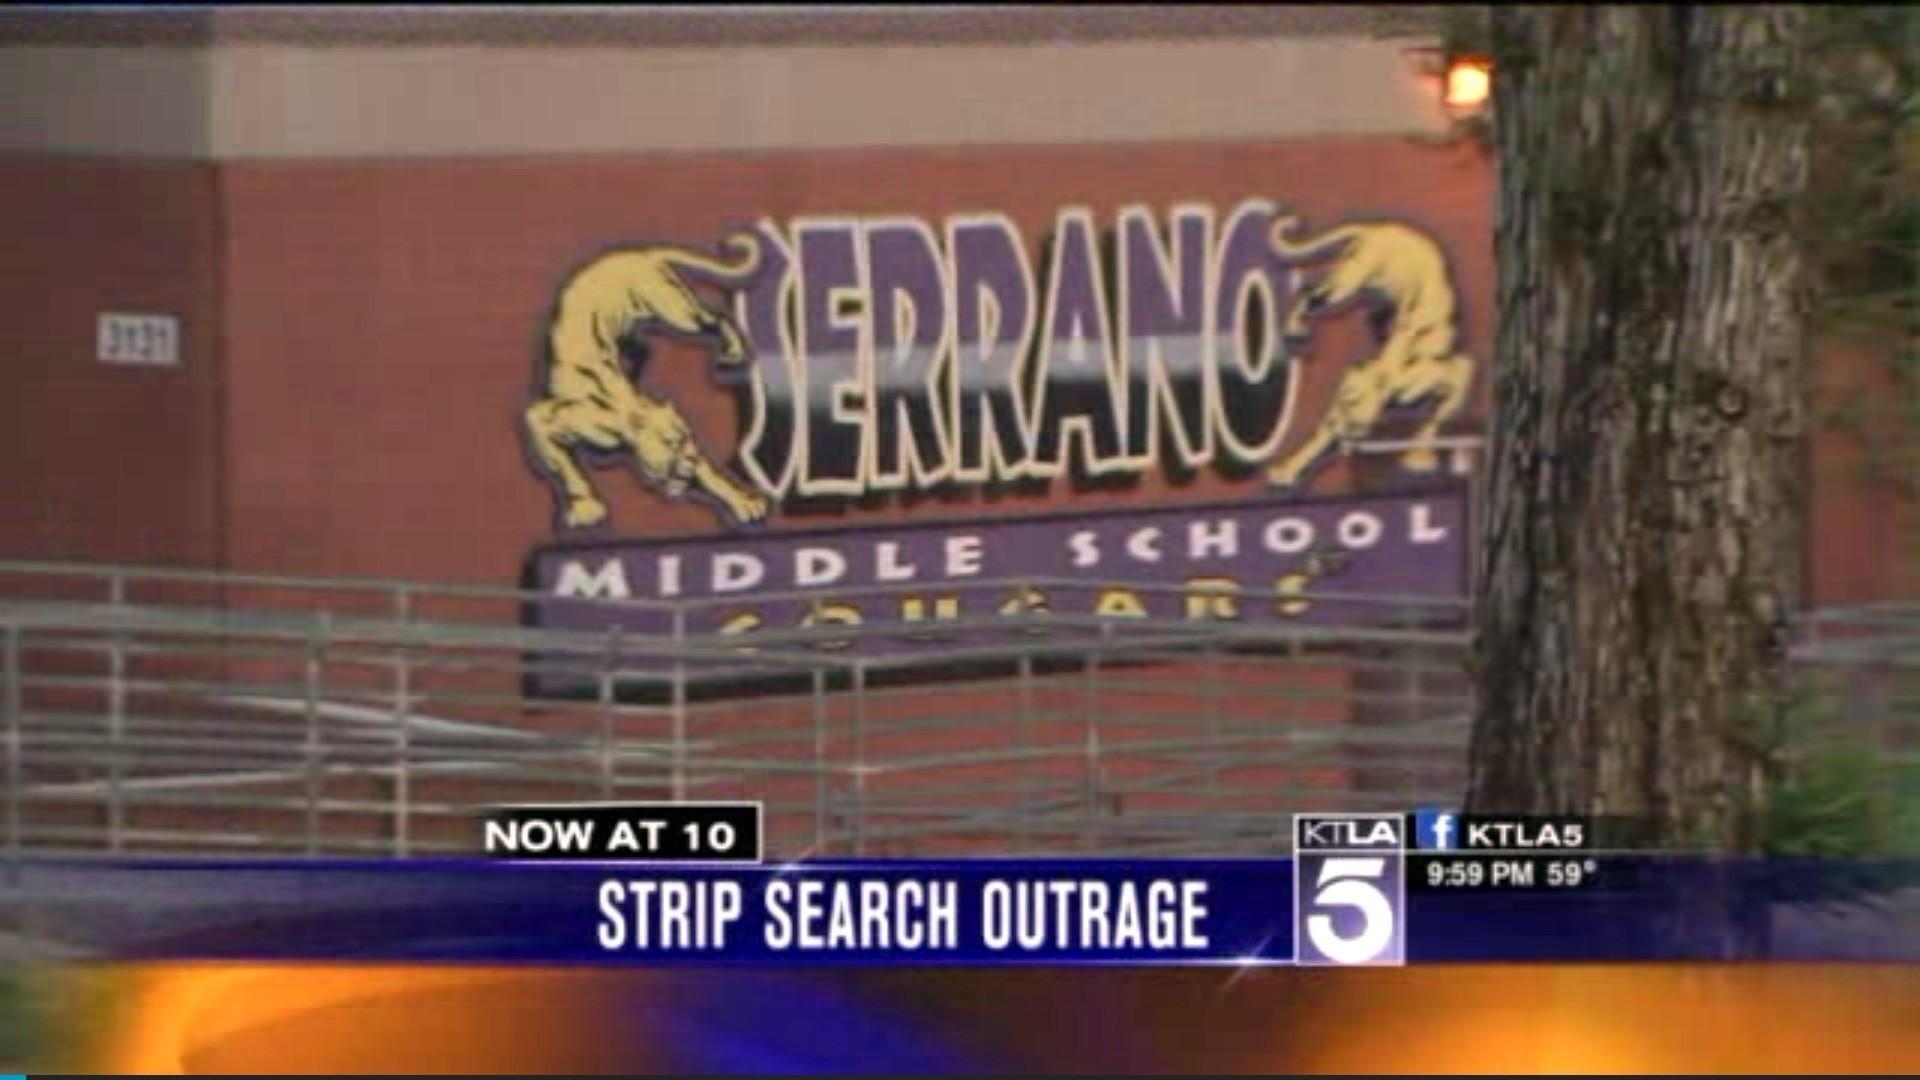 middle school teen strip